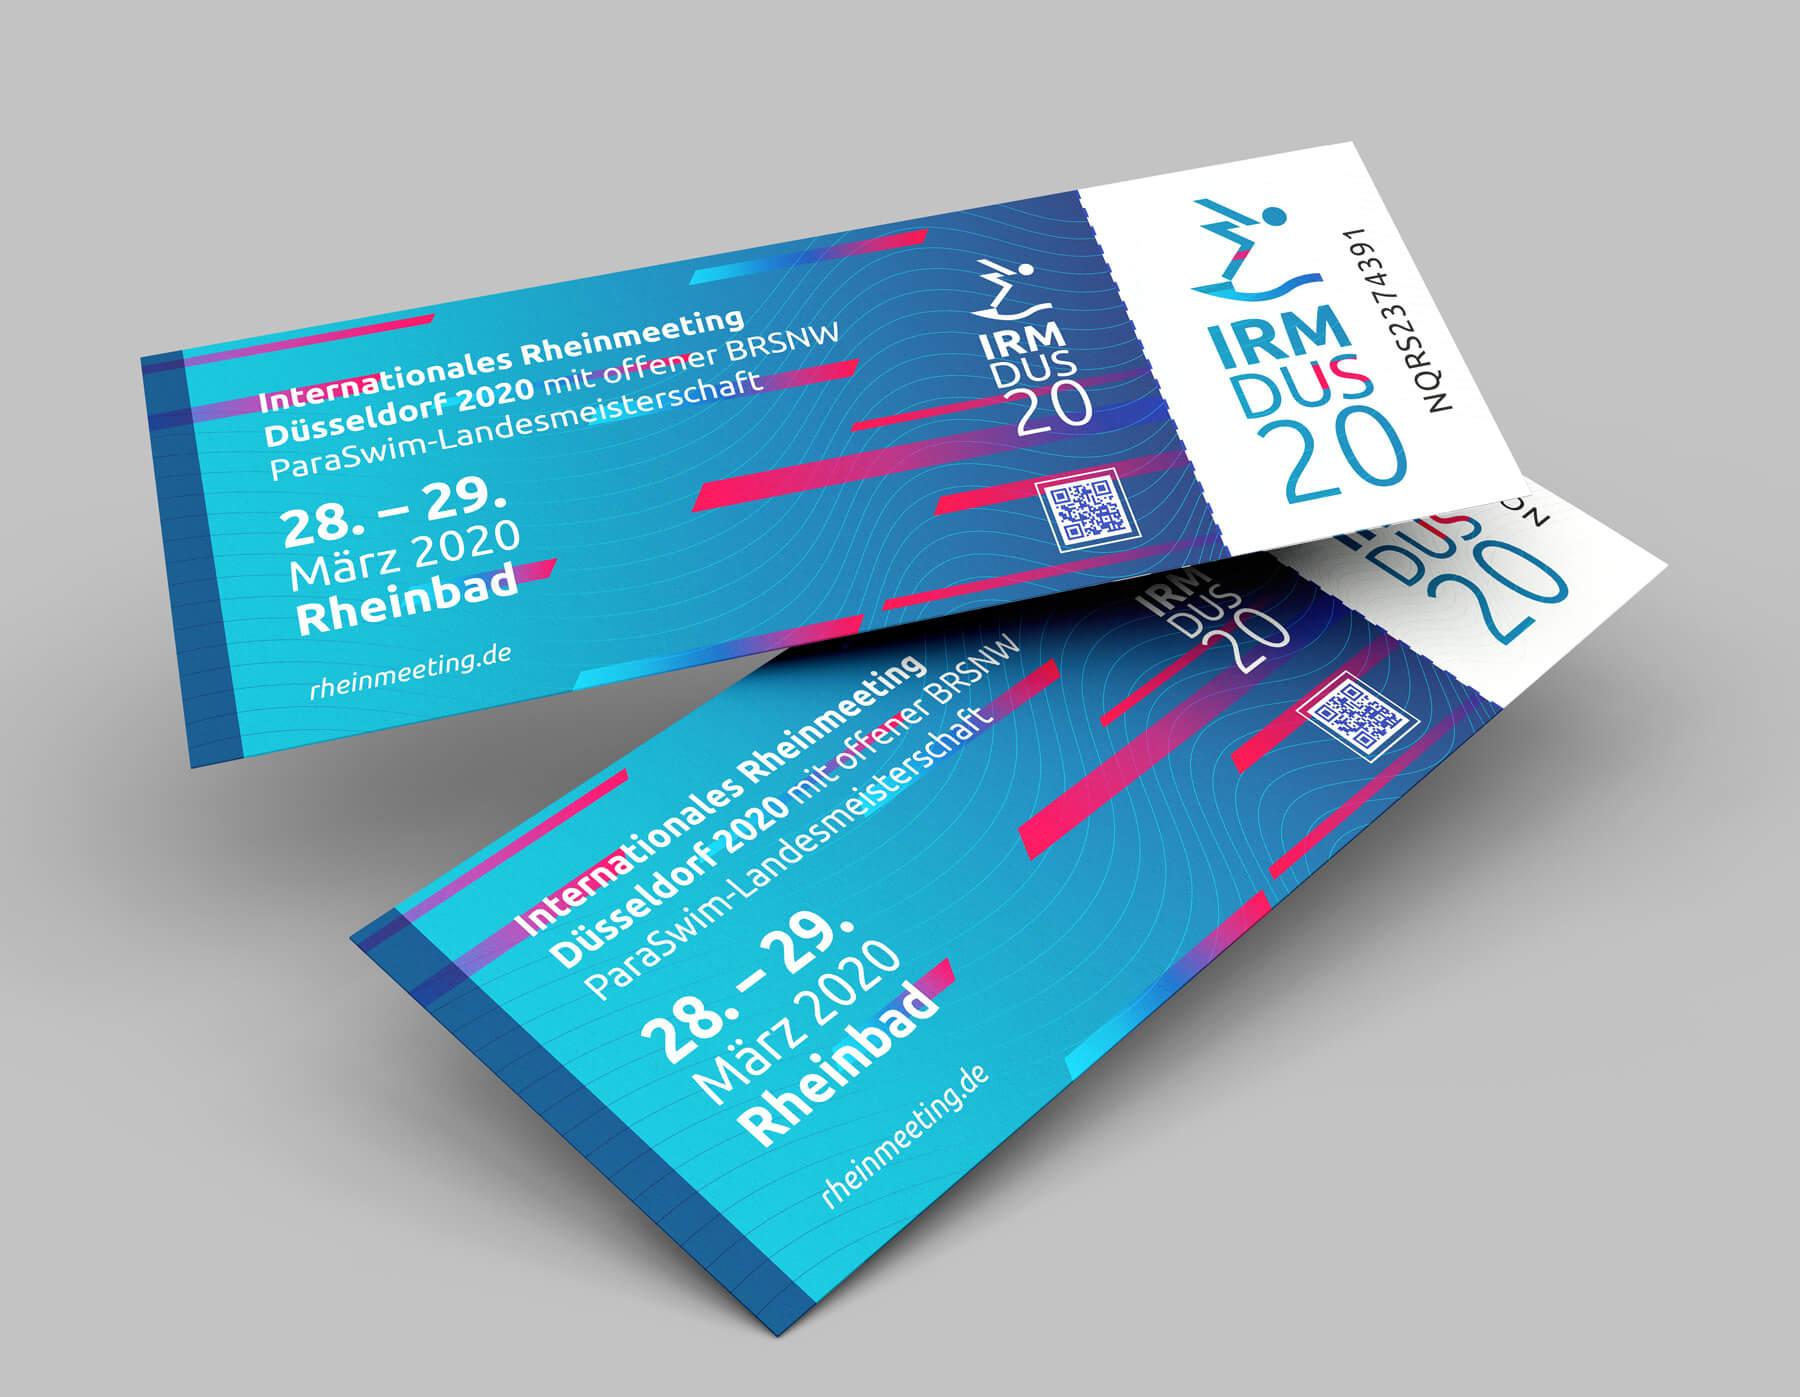 IRM DUS Logo Internationales Rheinmeeting Düsseldorf Eventmarketing Sport Tickets Ticketdesign